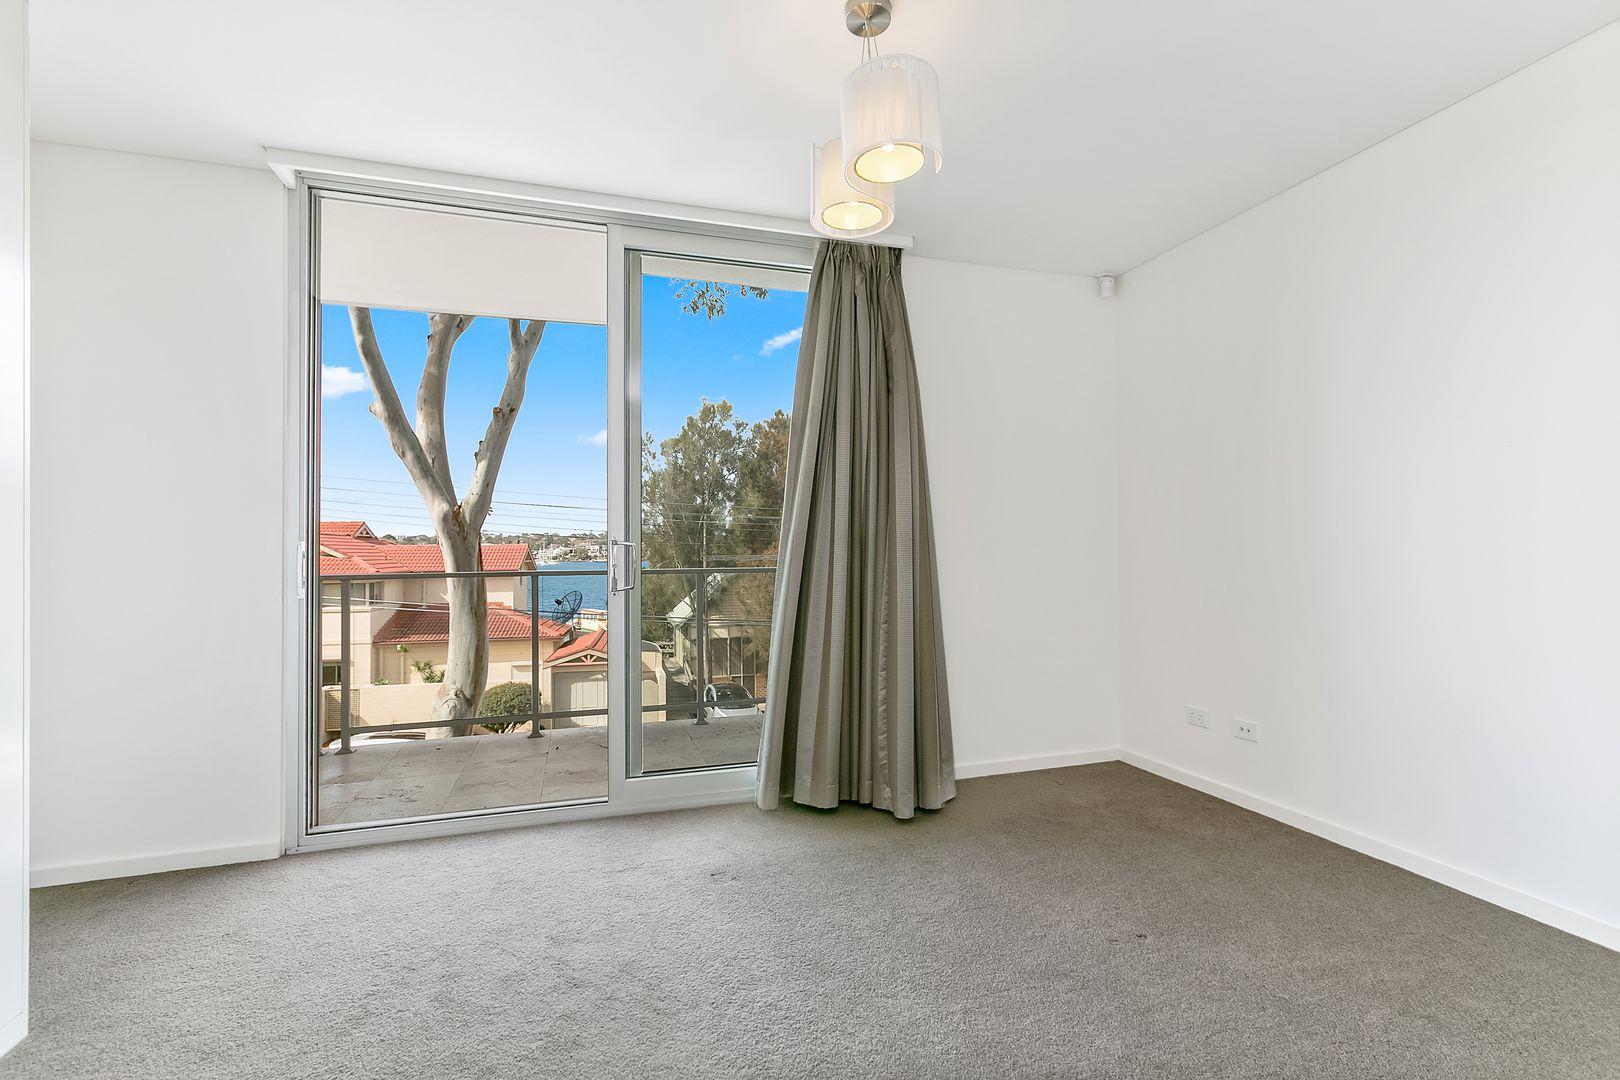 22/30 Hilly Street, Mortlake NSW 2137, Image 2